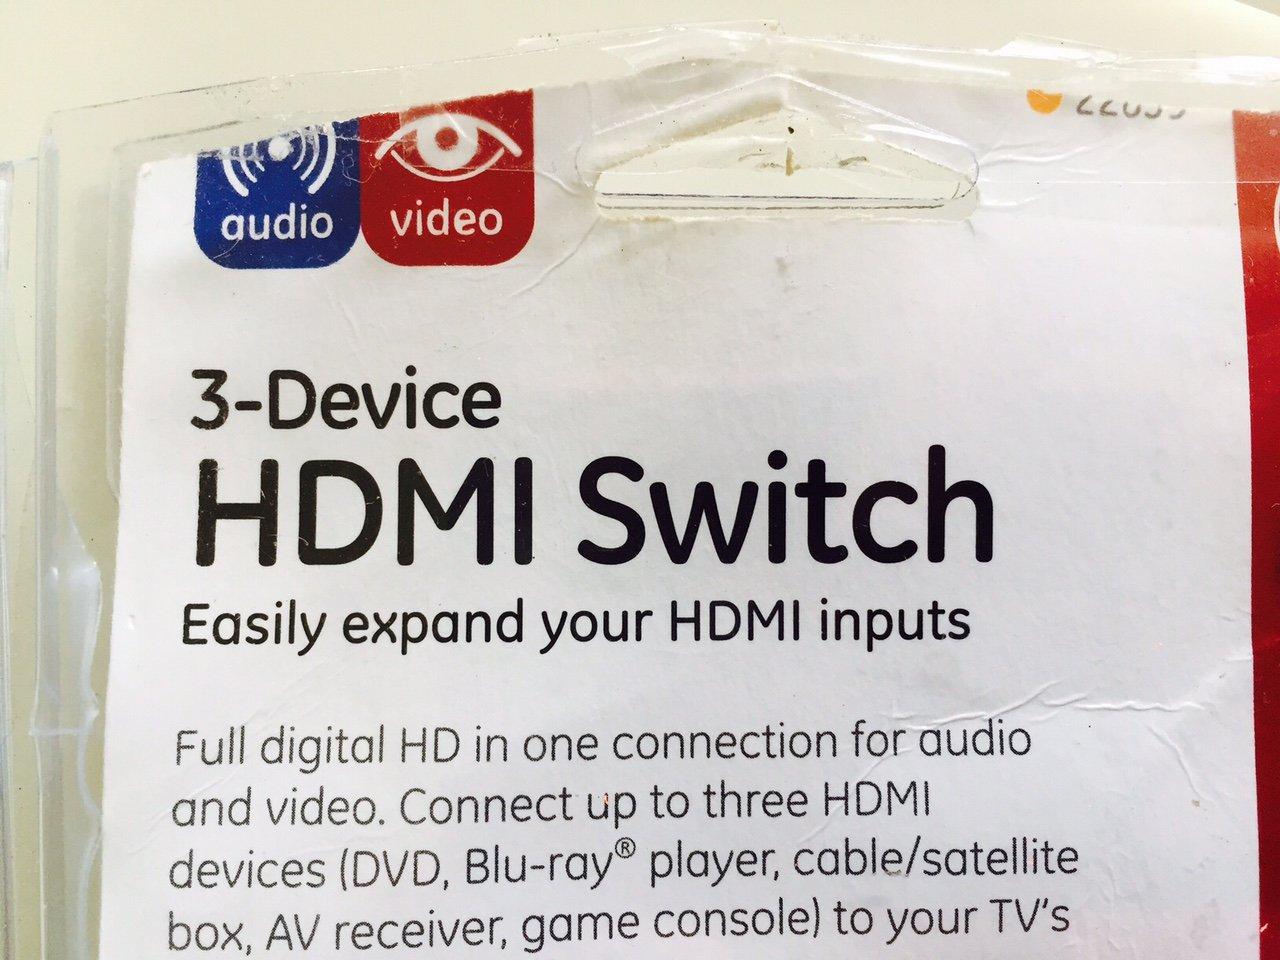 Amazon.com: GE 3 Device HDMI Switch - 11701: Home Audio & Theater